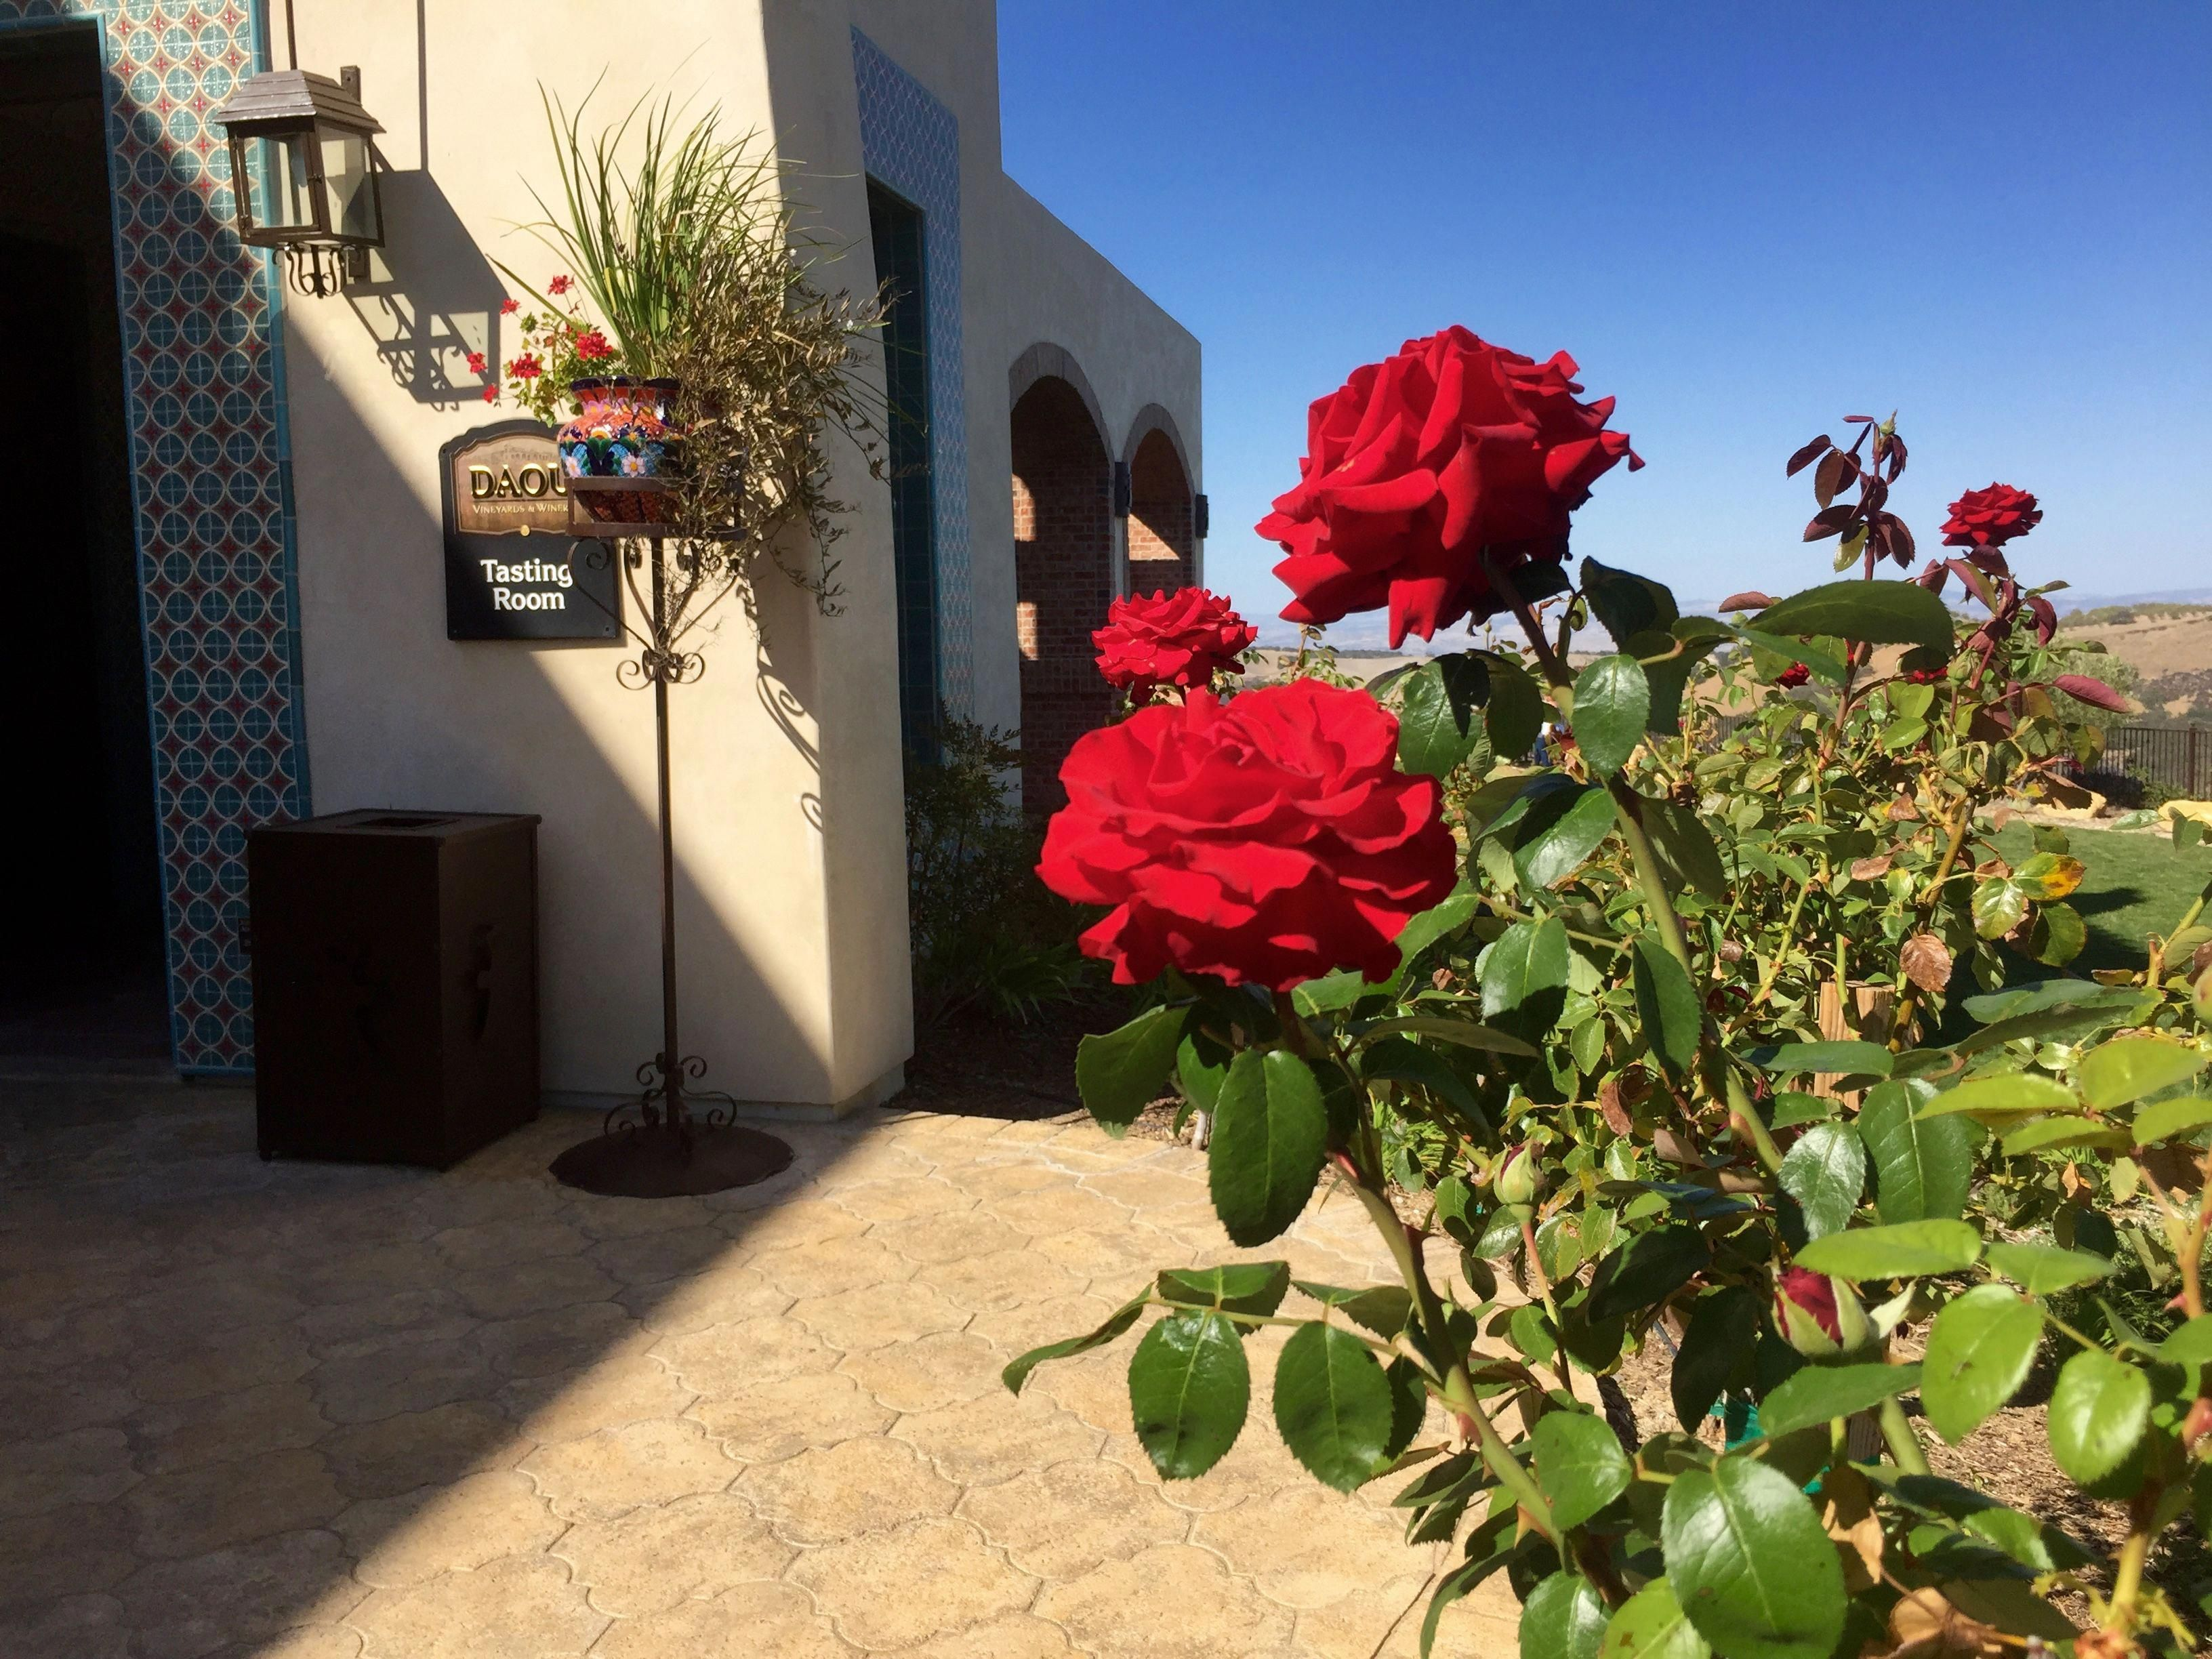 Daou Vineyards In Paso Robles California Pasorobleswineries Paso Robles Paso Robles Wineries California Adventure